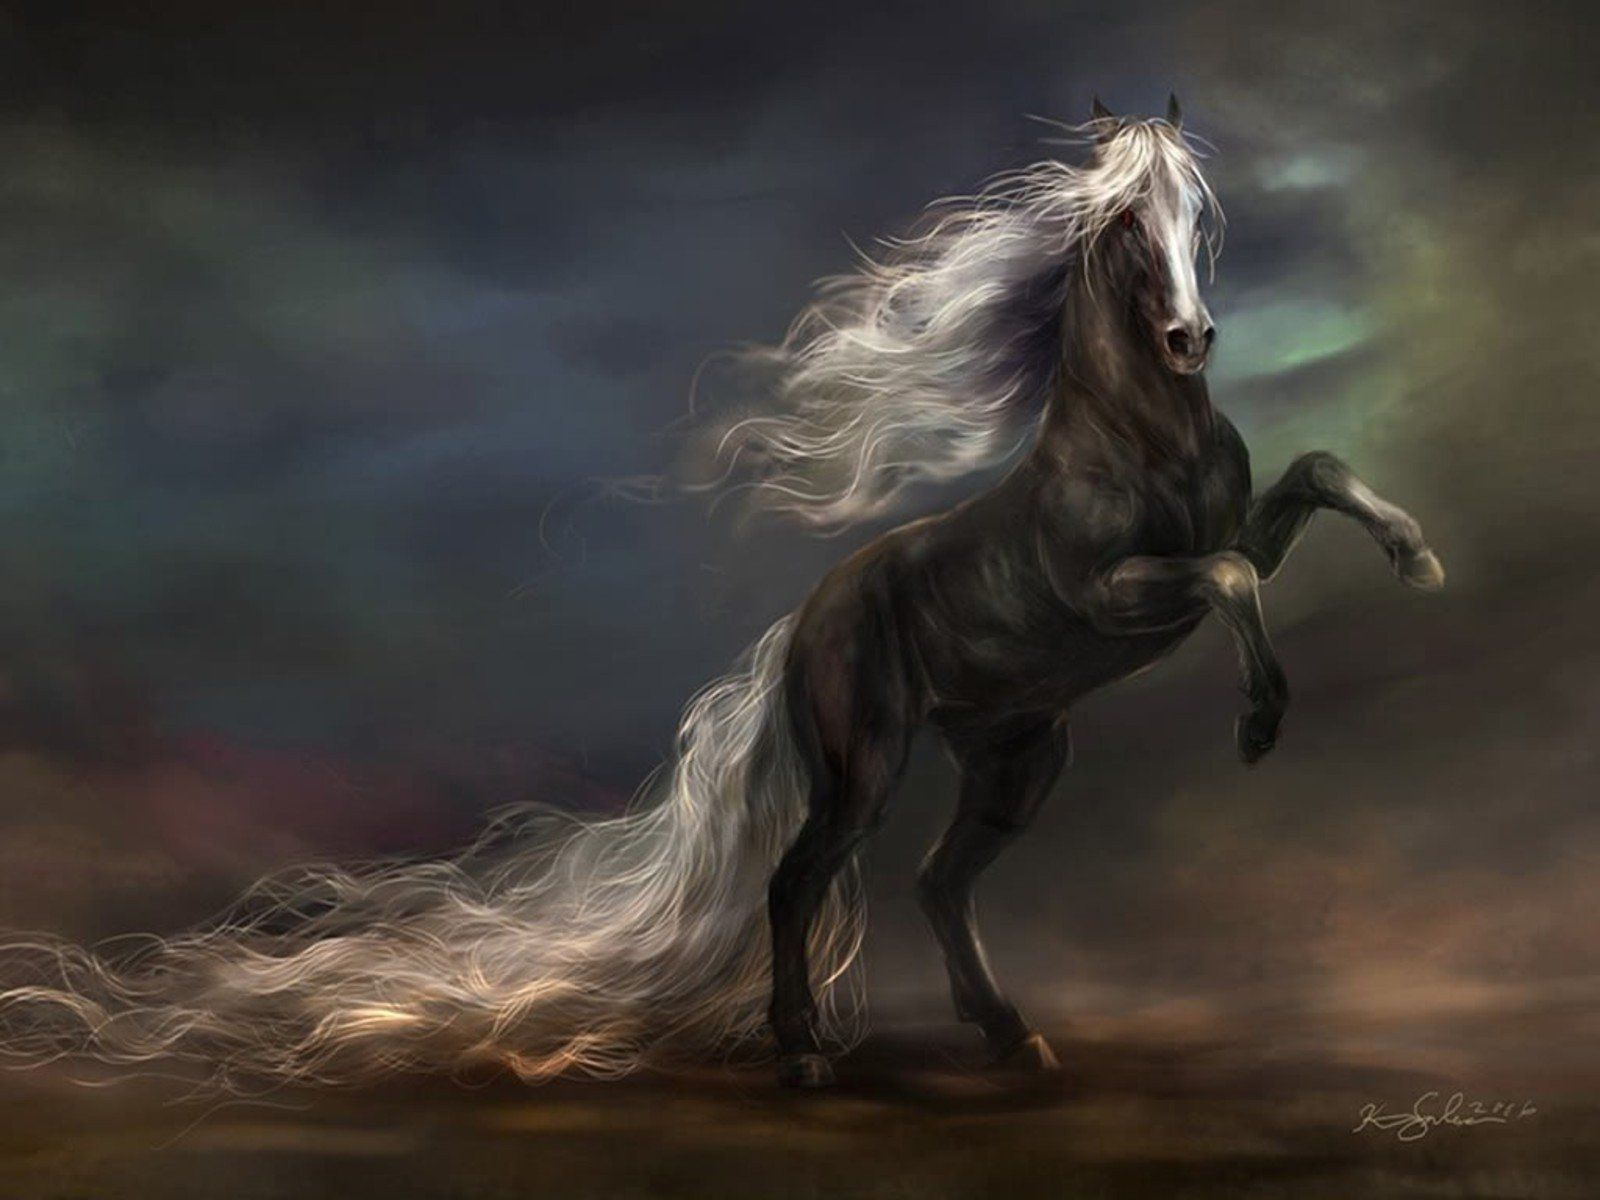 Horse Art Wallpapers Top Free Horse Art Backgrounds Wallpaperaccess